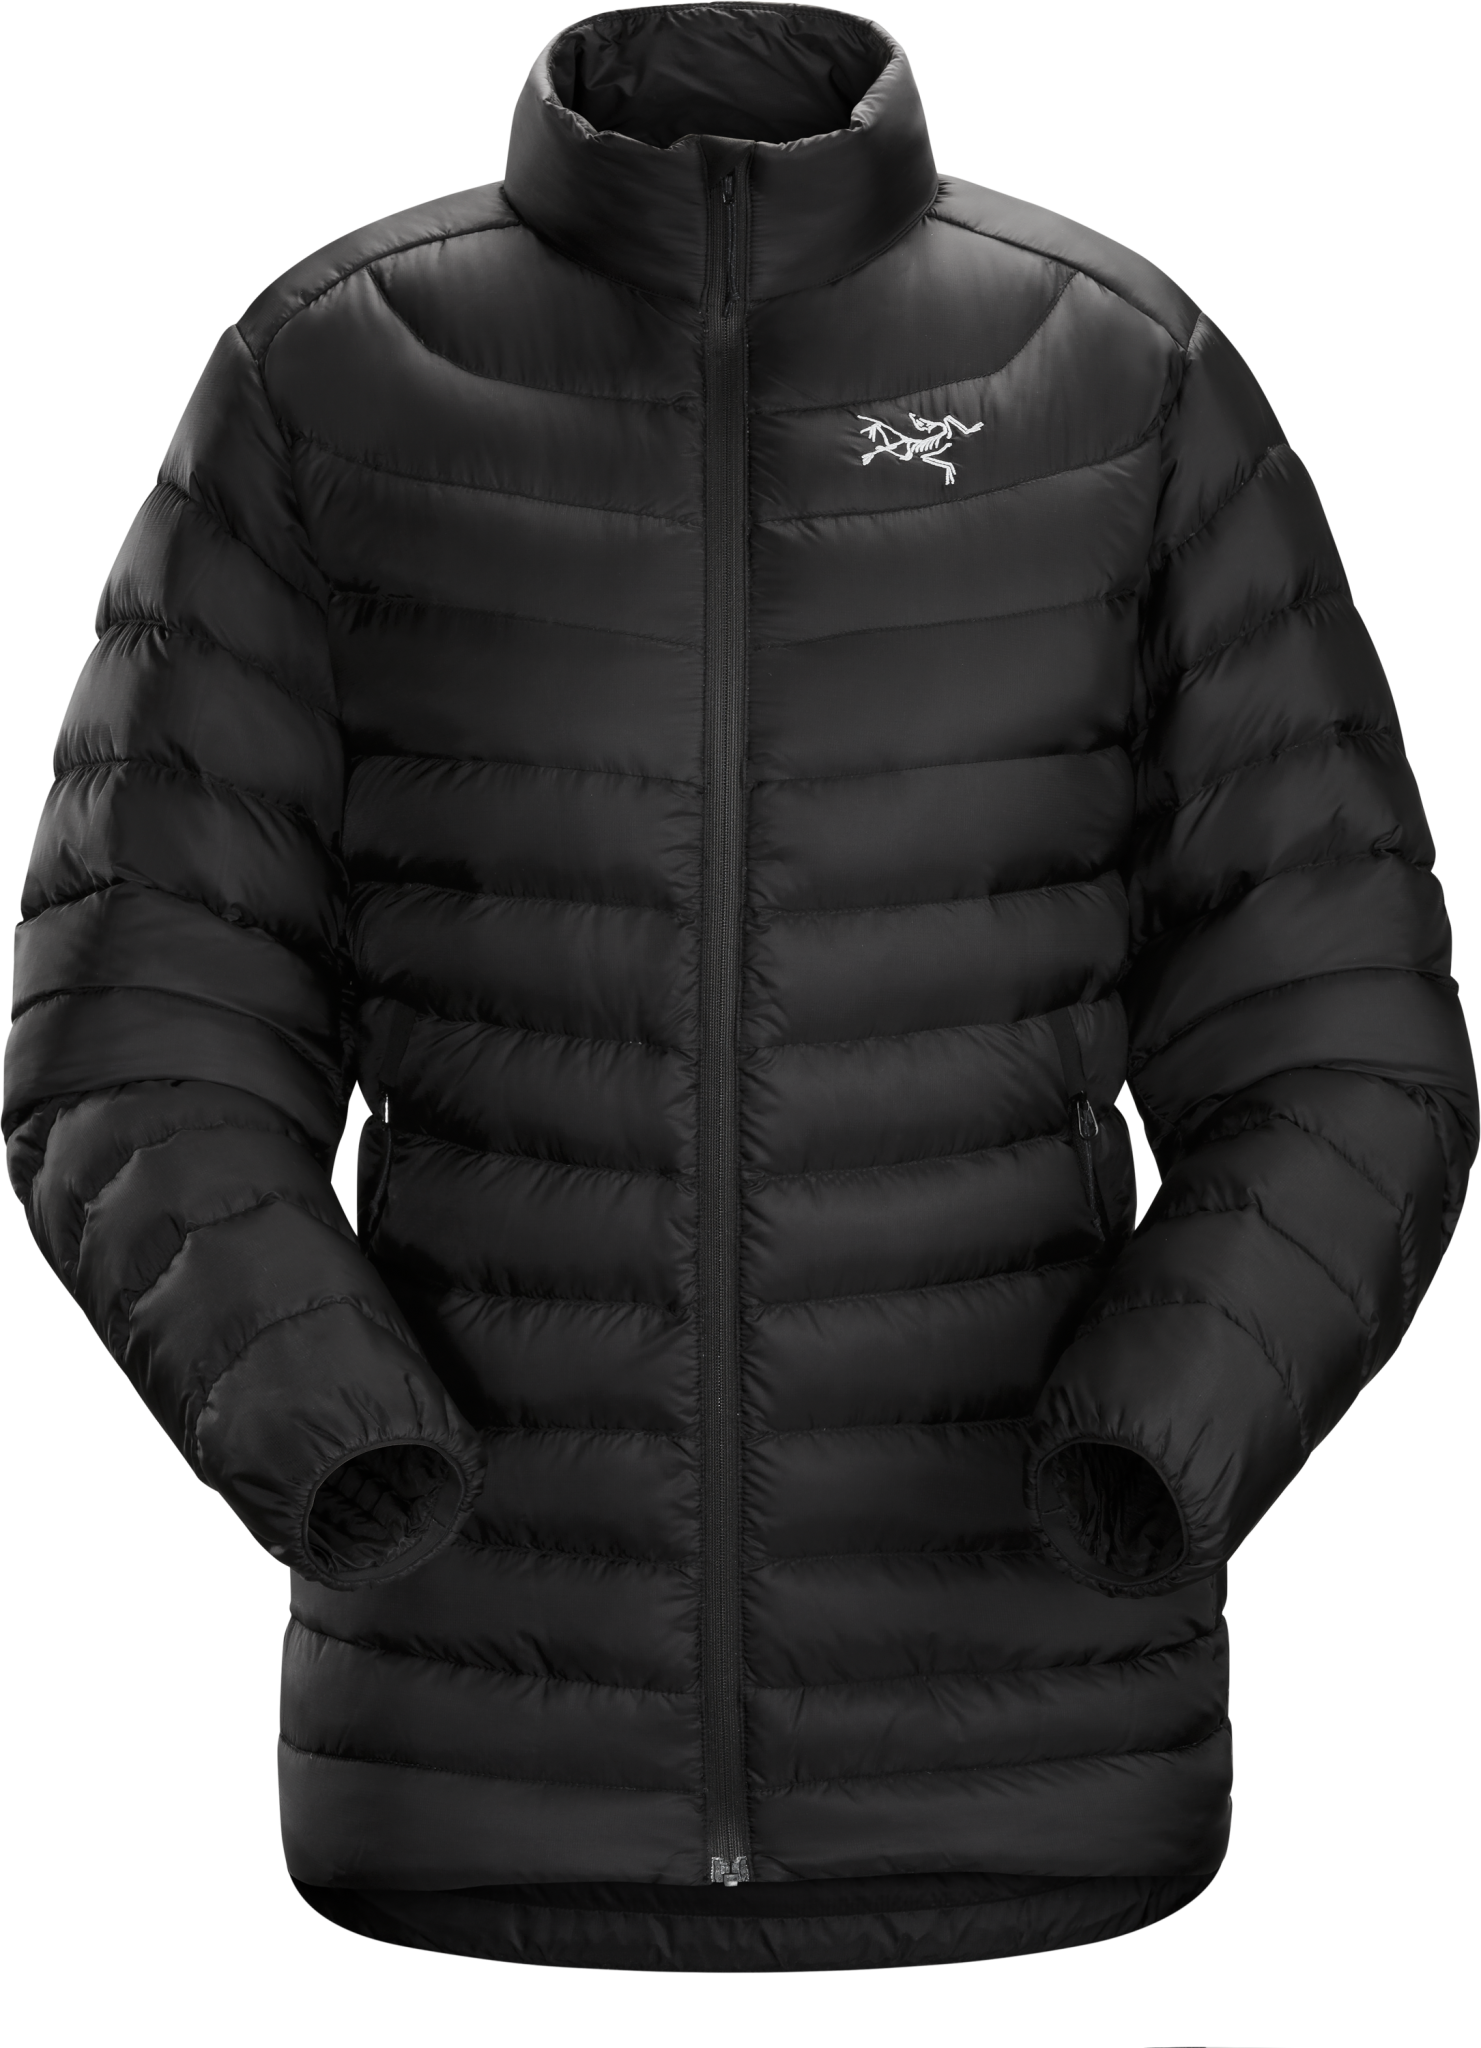 Arc'teryx Cerium LT Jacket Women's-1